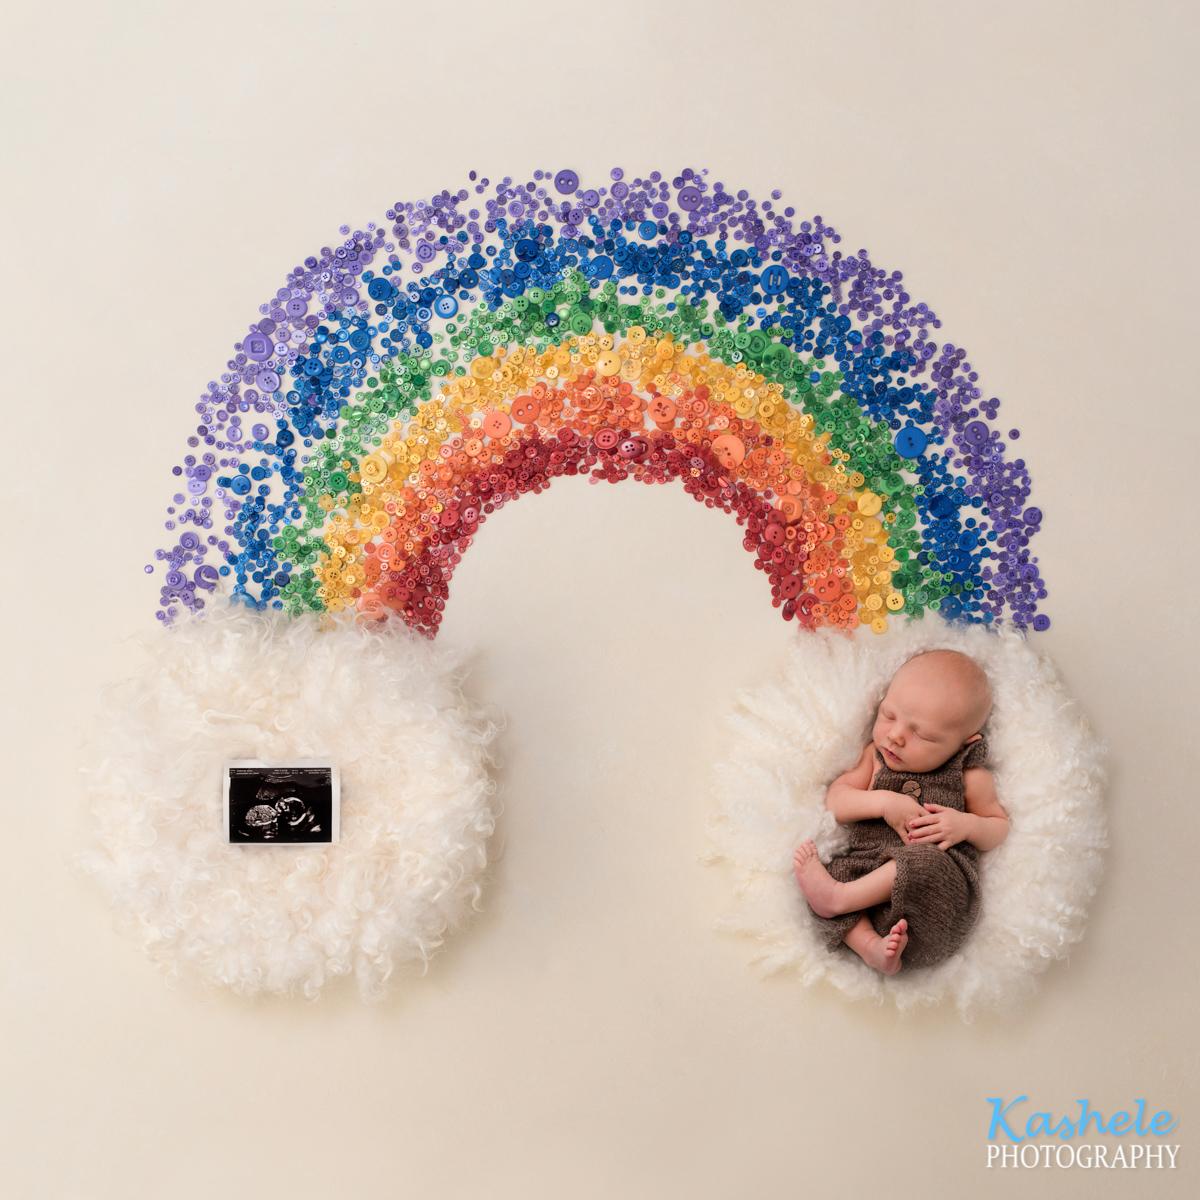 Rainbow image for Alexis' rainbow baby